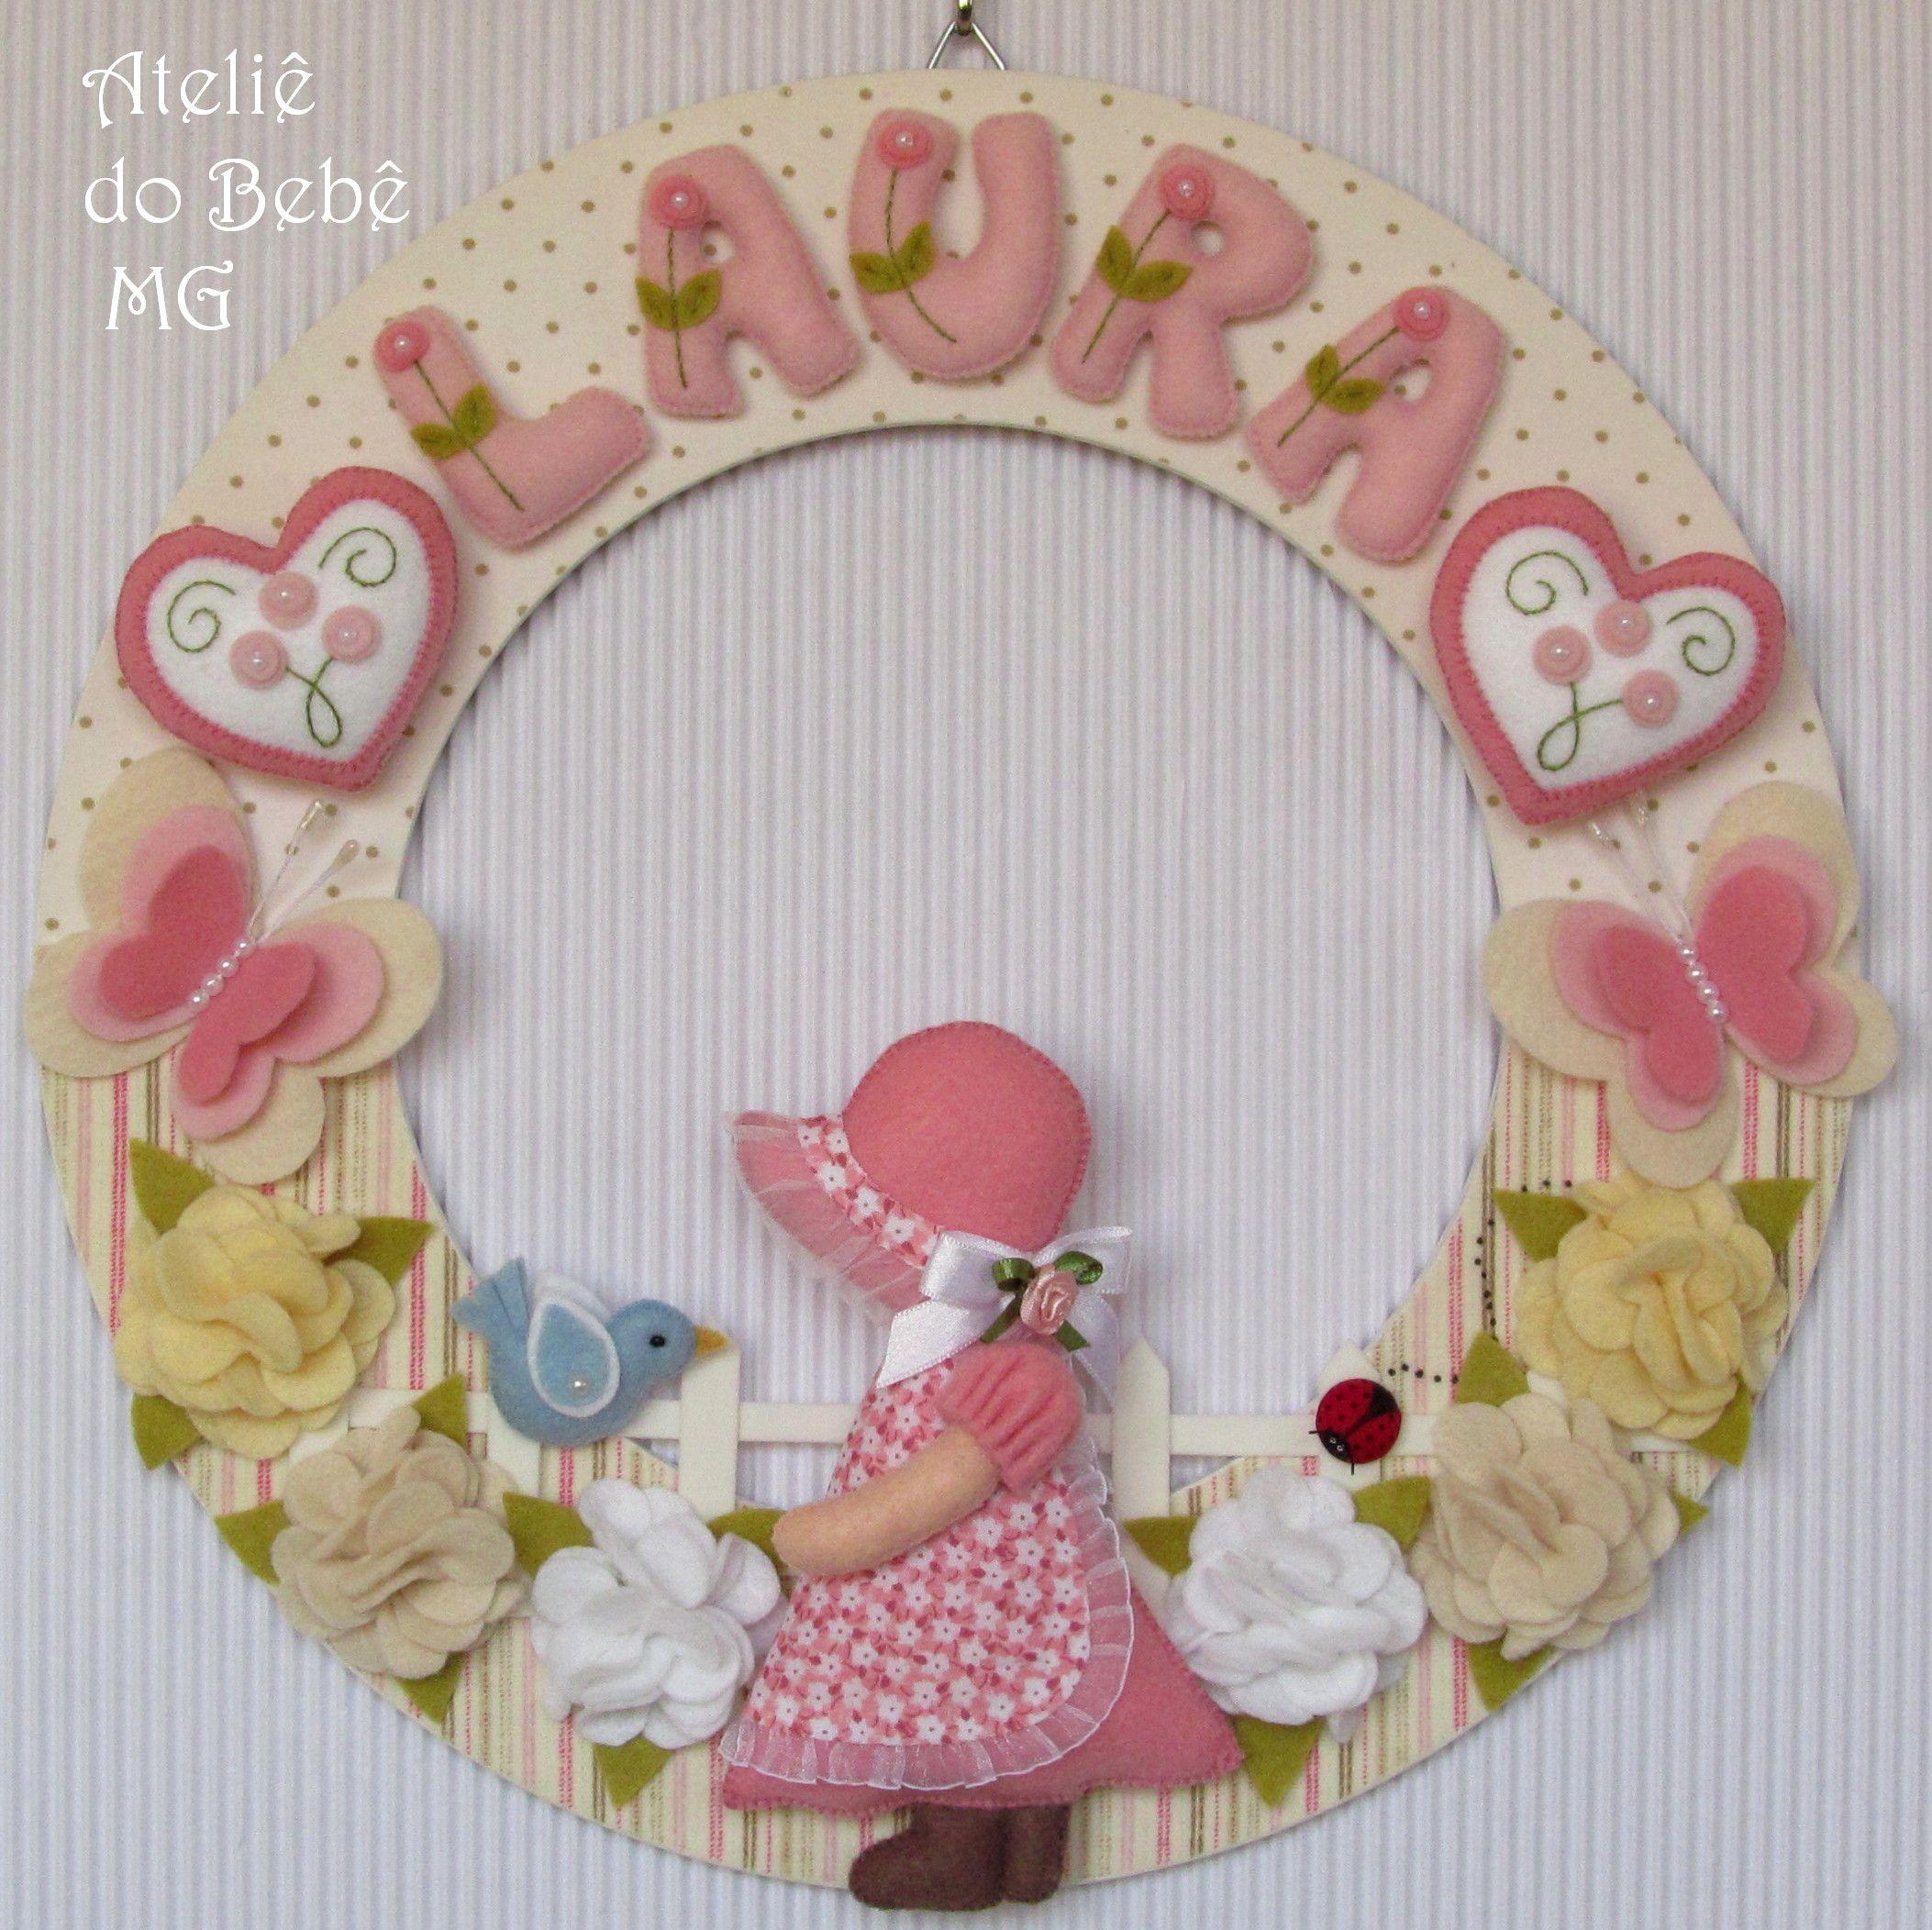 Baby Workshop MG